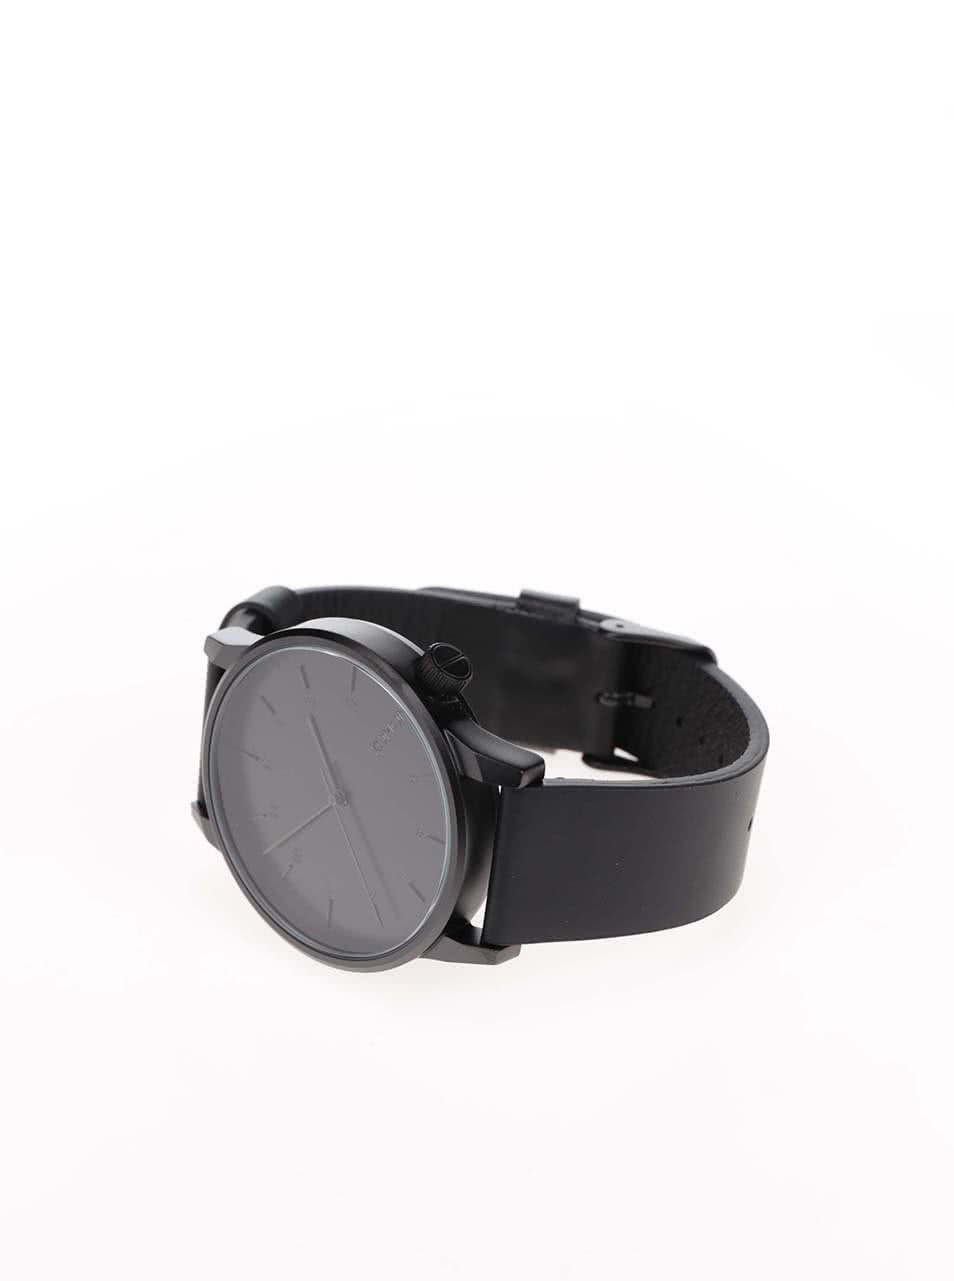 0439575c1 Pánské hodinky s černým koženým páskem Komono Winston Regal   ZOOT.cz